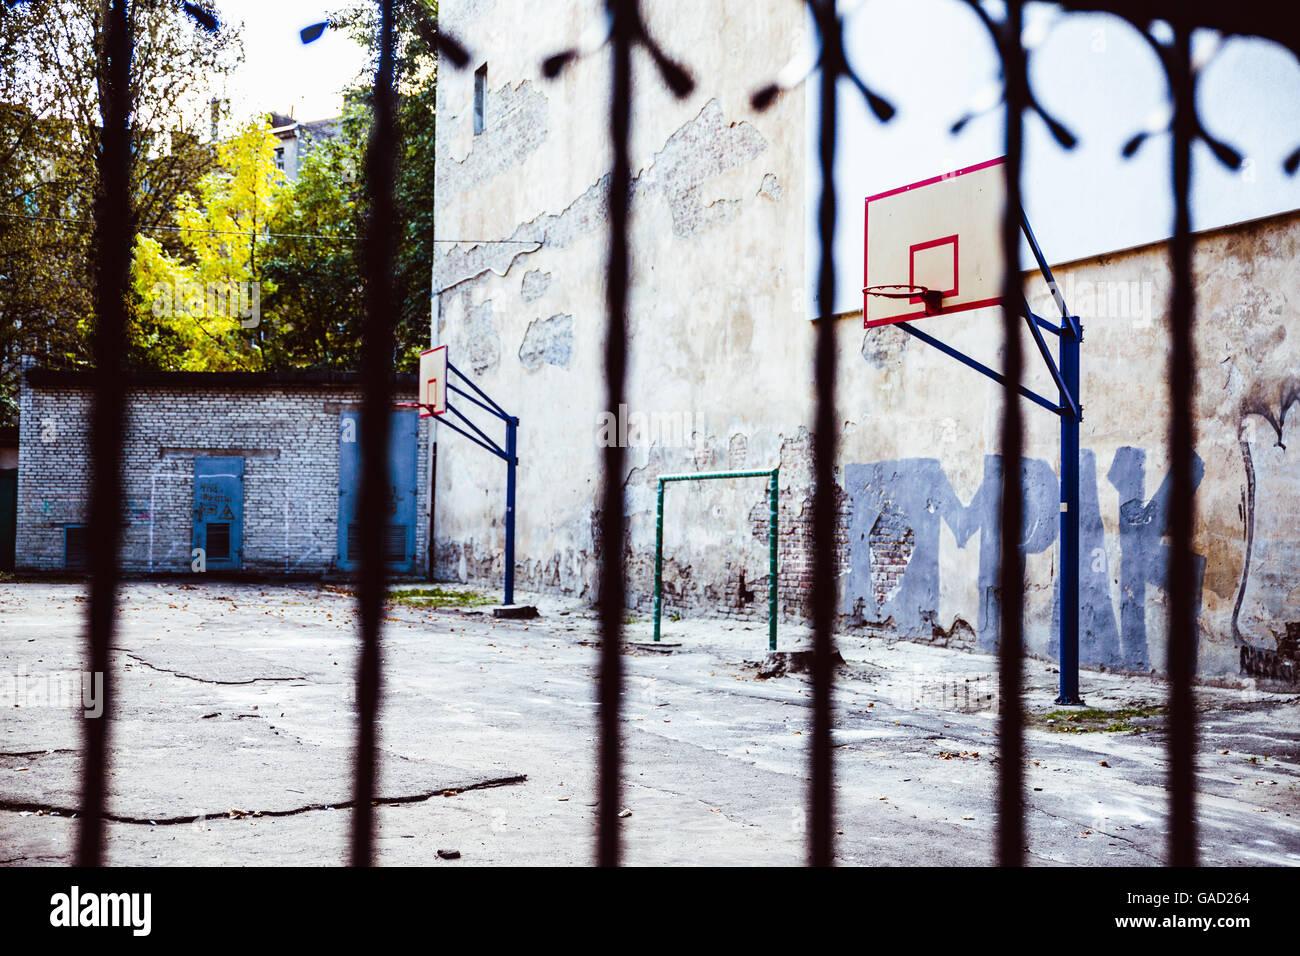 abandoned Basketball court backyard - Stock Image